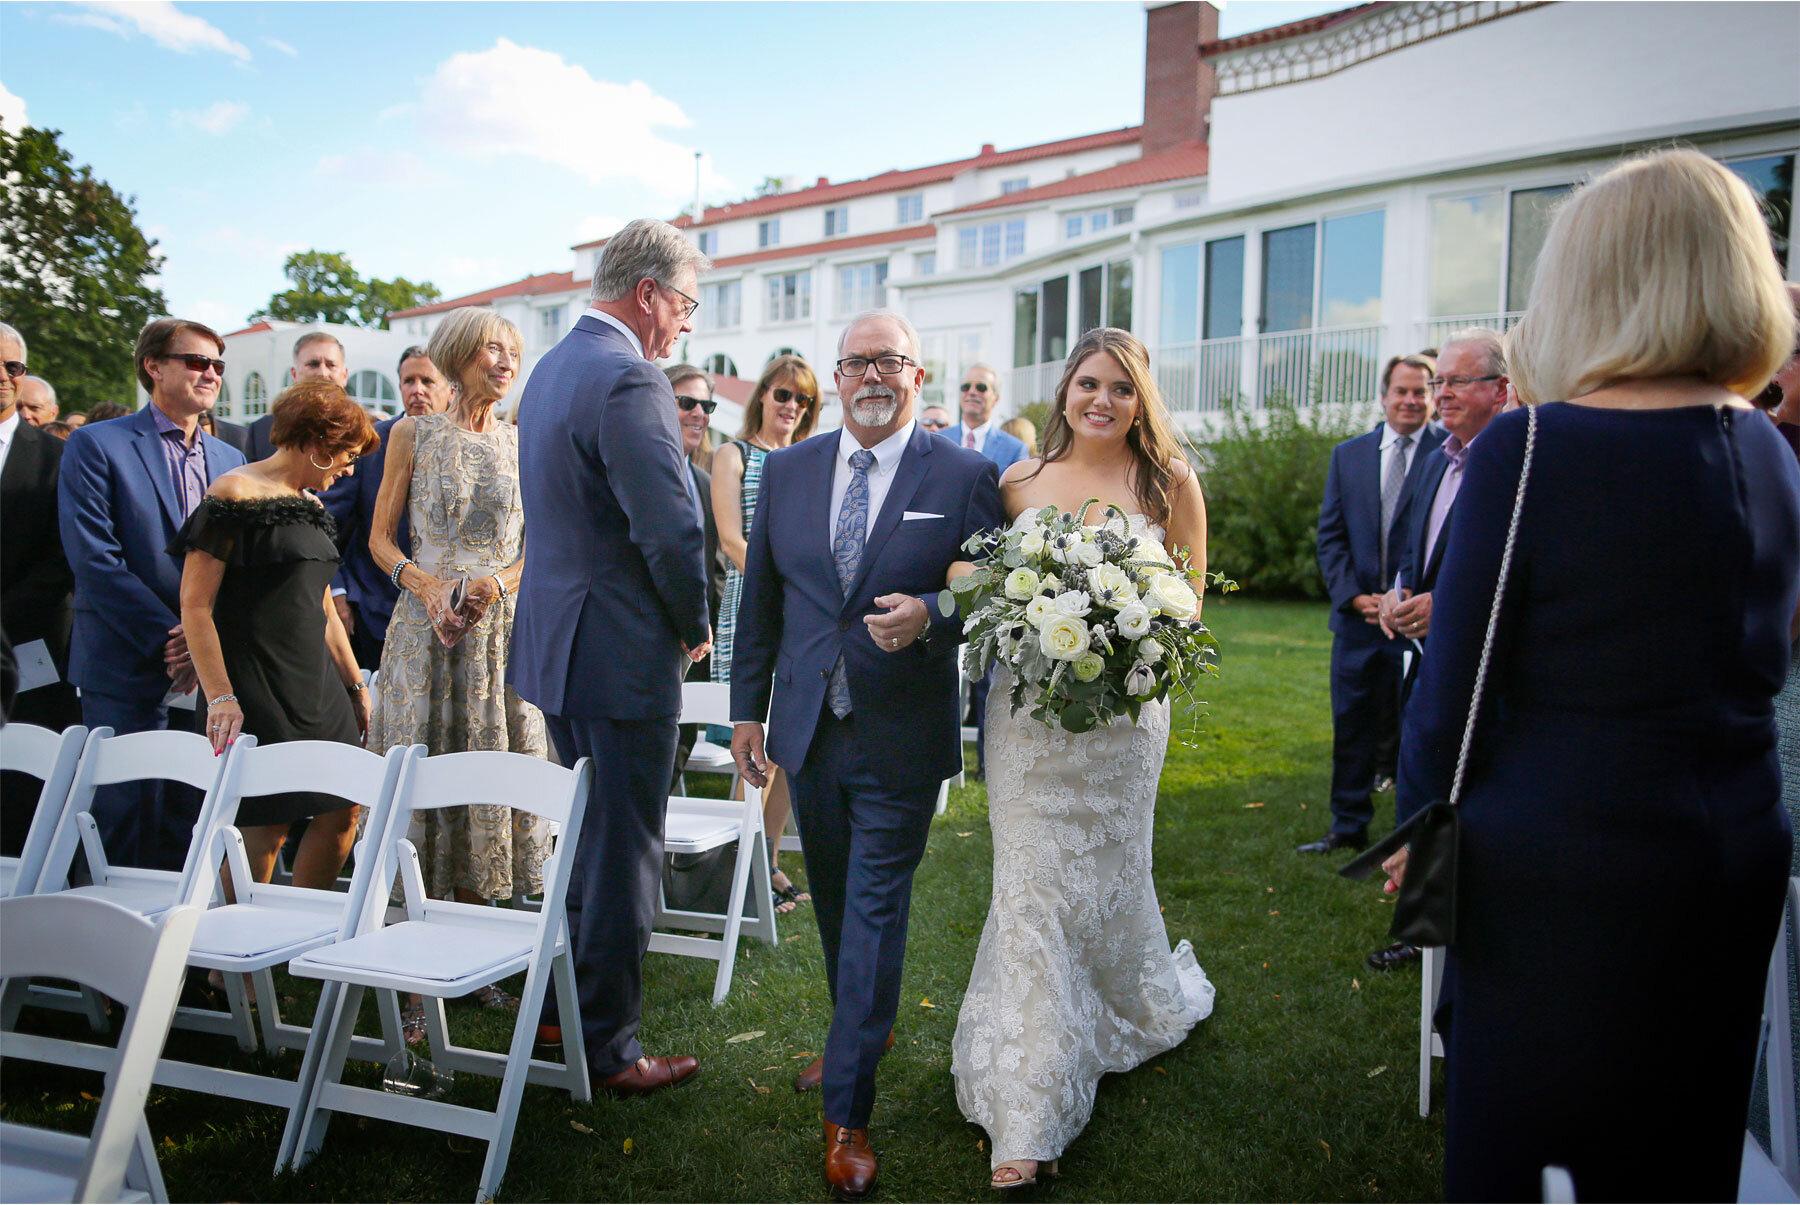 12-Vick-Photography-Wedding-Minnetonka-Minnesota-Lafayette-Club-Outdoor-Ceremony-Katie-and-David.jpg